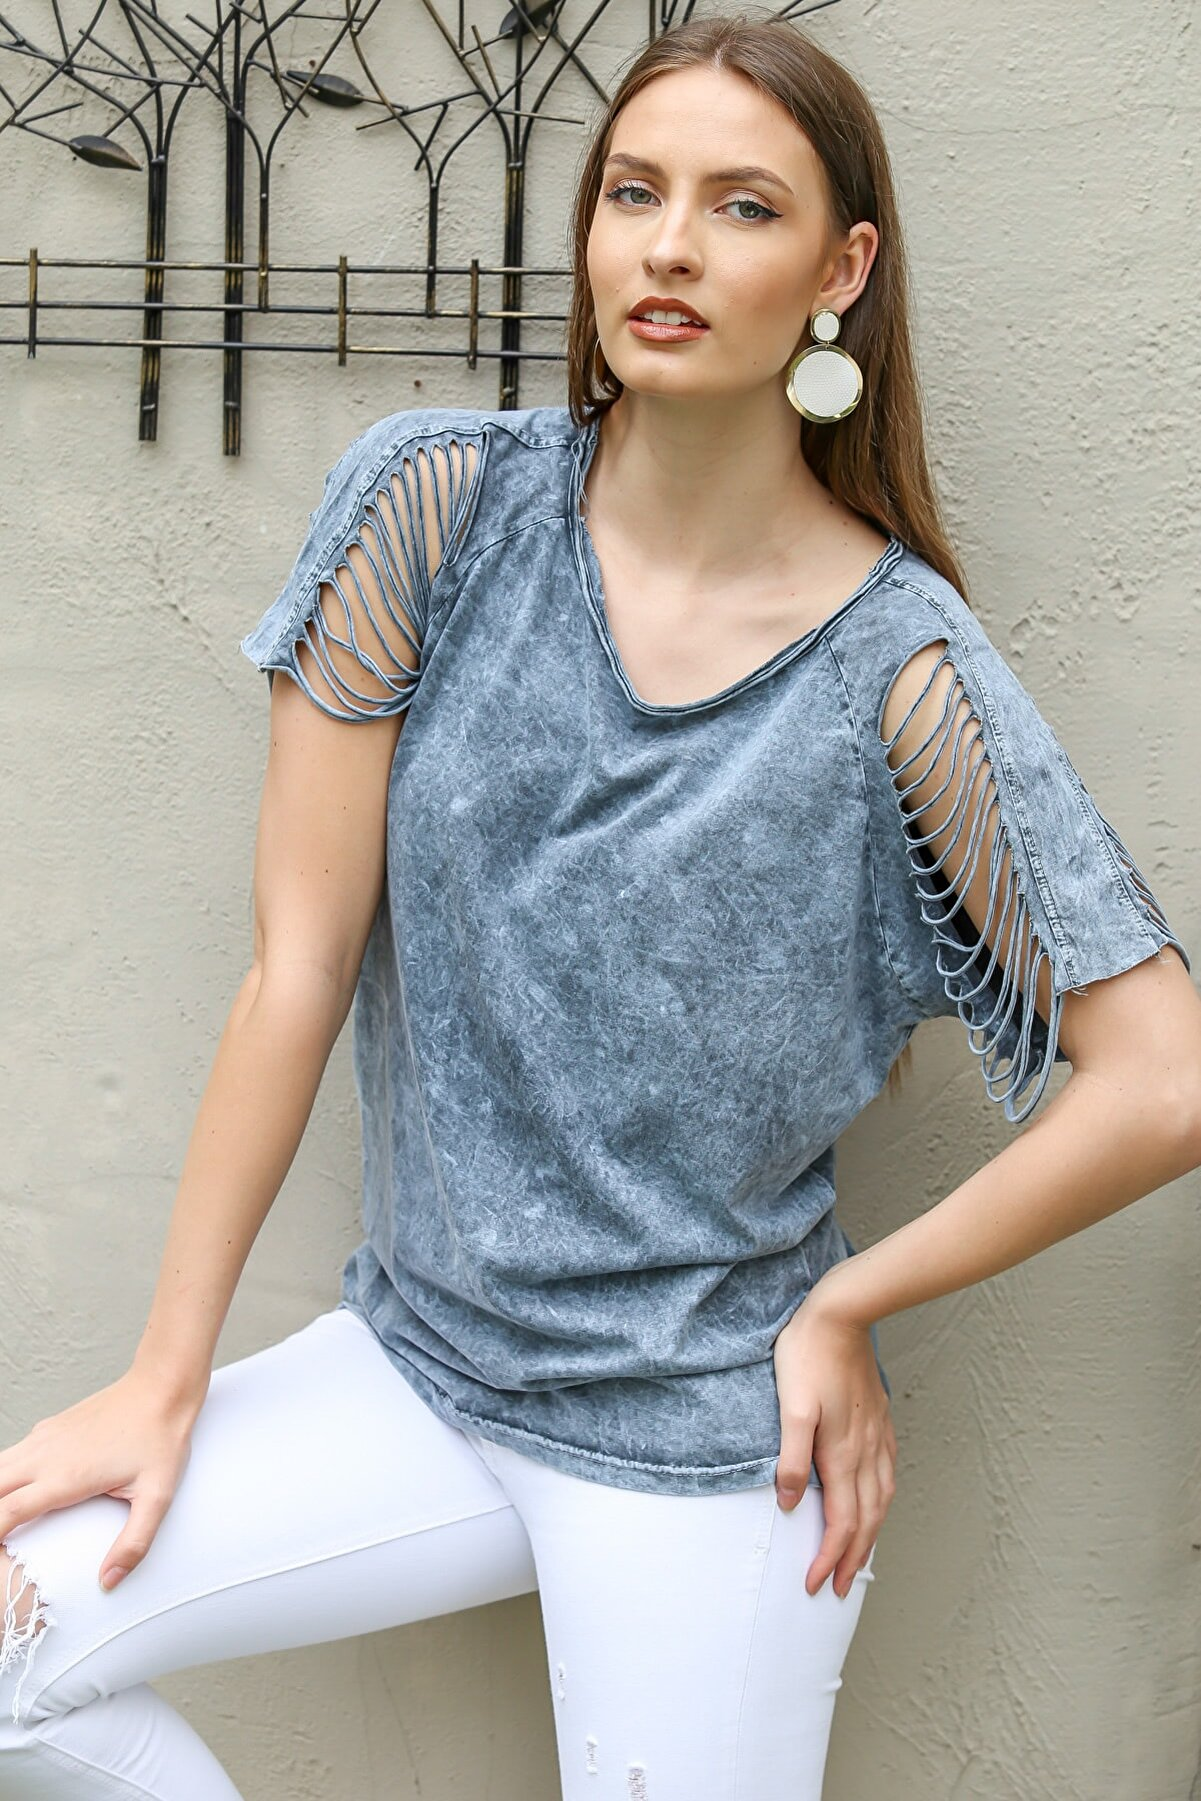 Chiccy Kadın Gri Omuzları Lazer Kesim Detaylı Yıkamalı T-Shirt M10010300TS98224